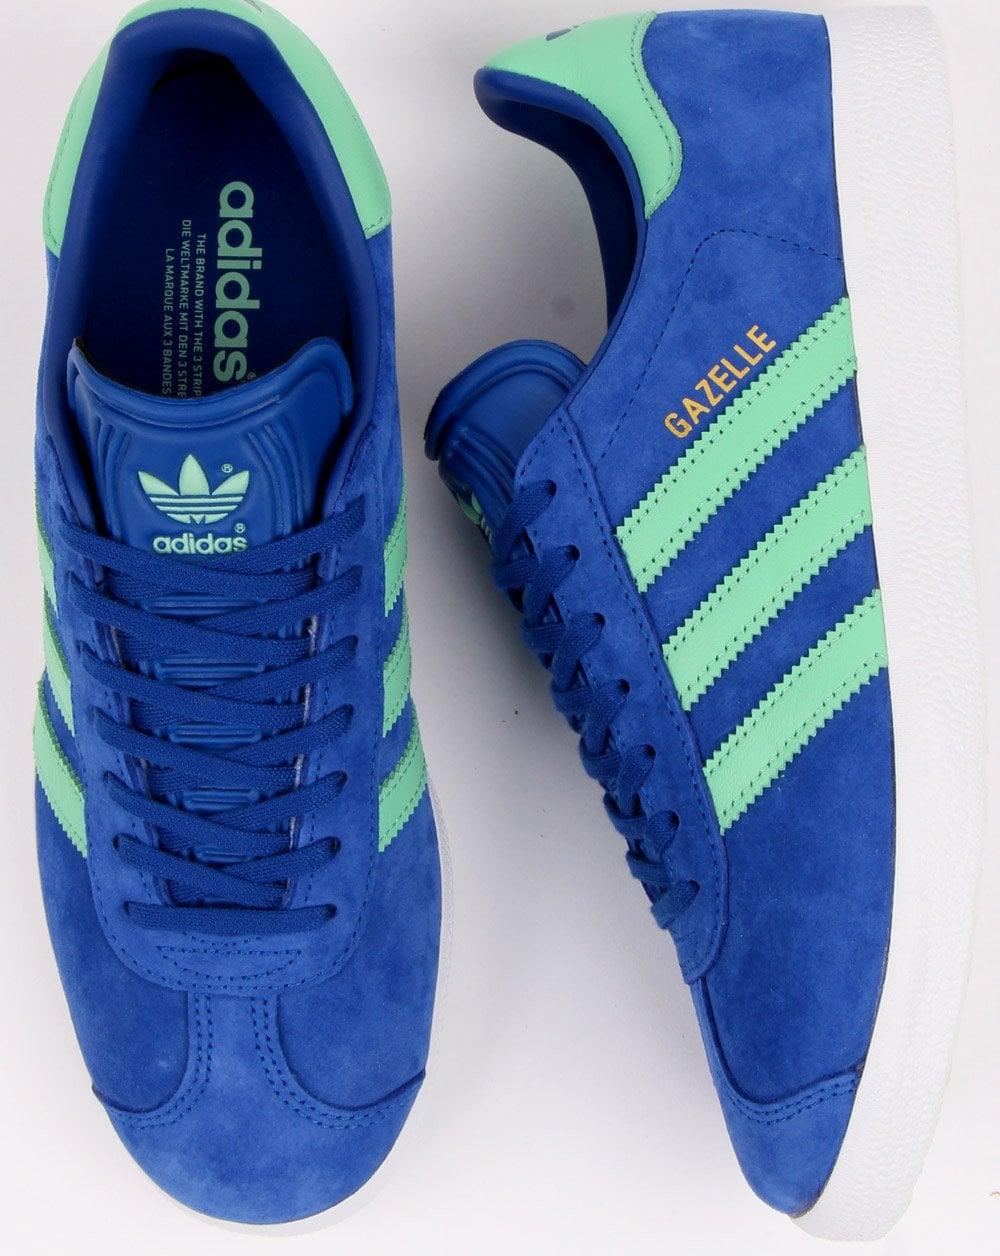 Adidas Gazelle Trainers Royal Blue